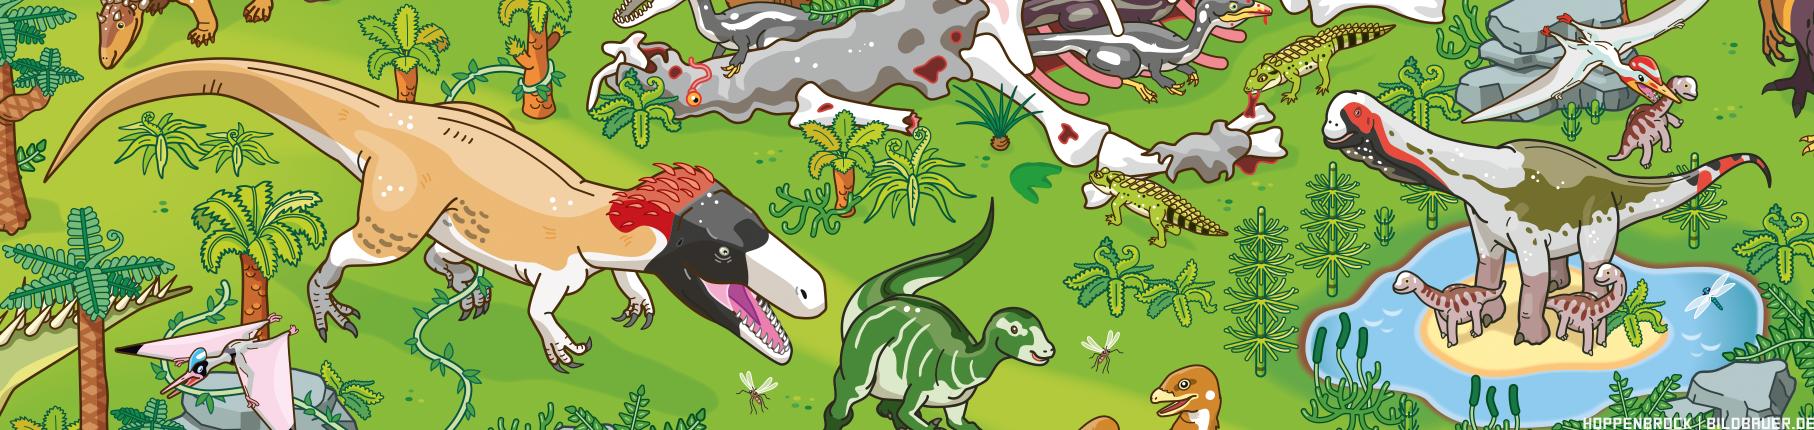 Wiehenvenator and Europasaurus by Christoph Hoppenbrock